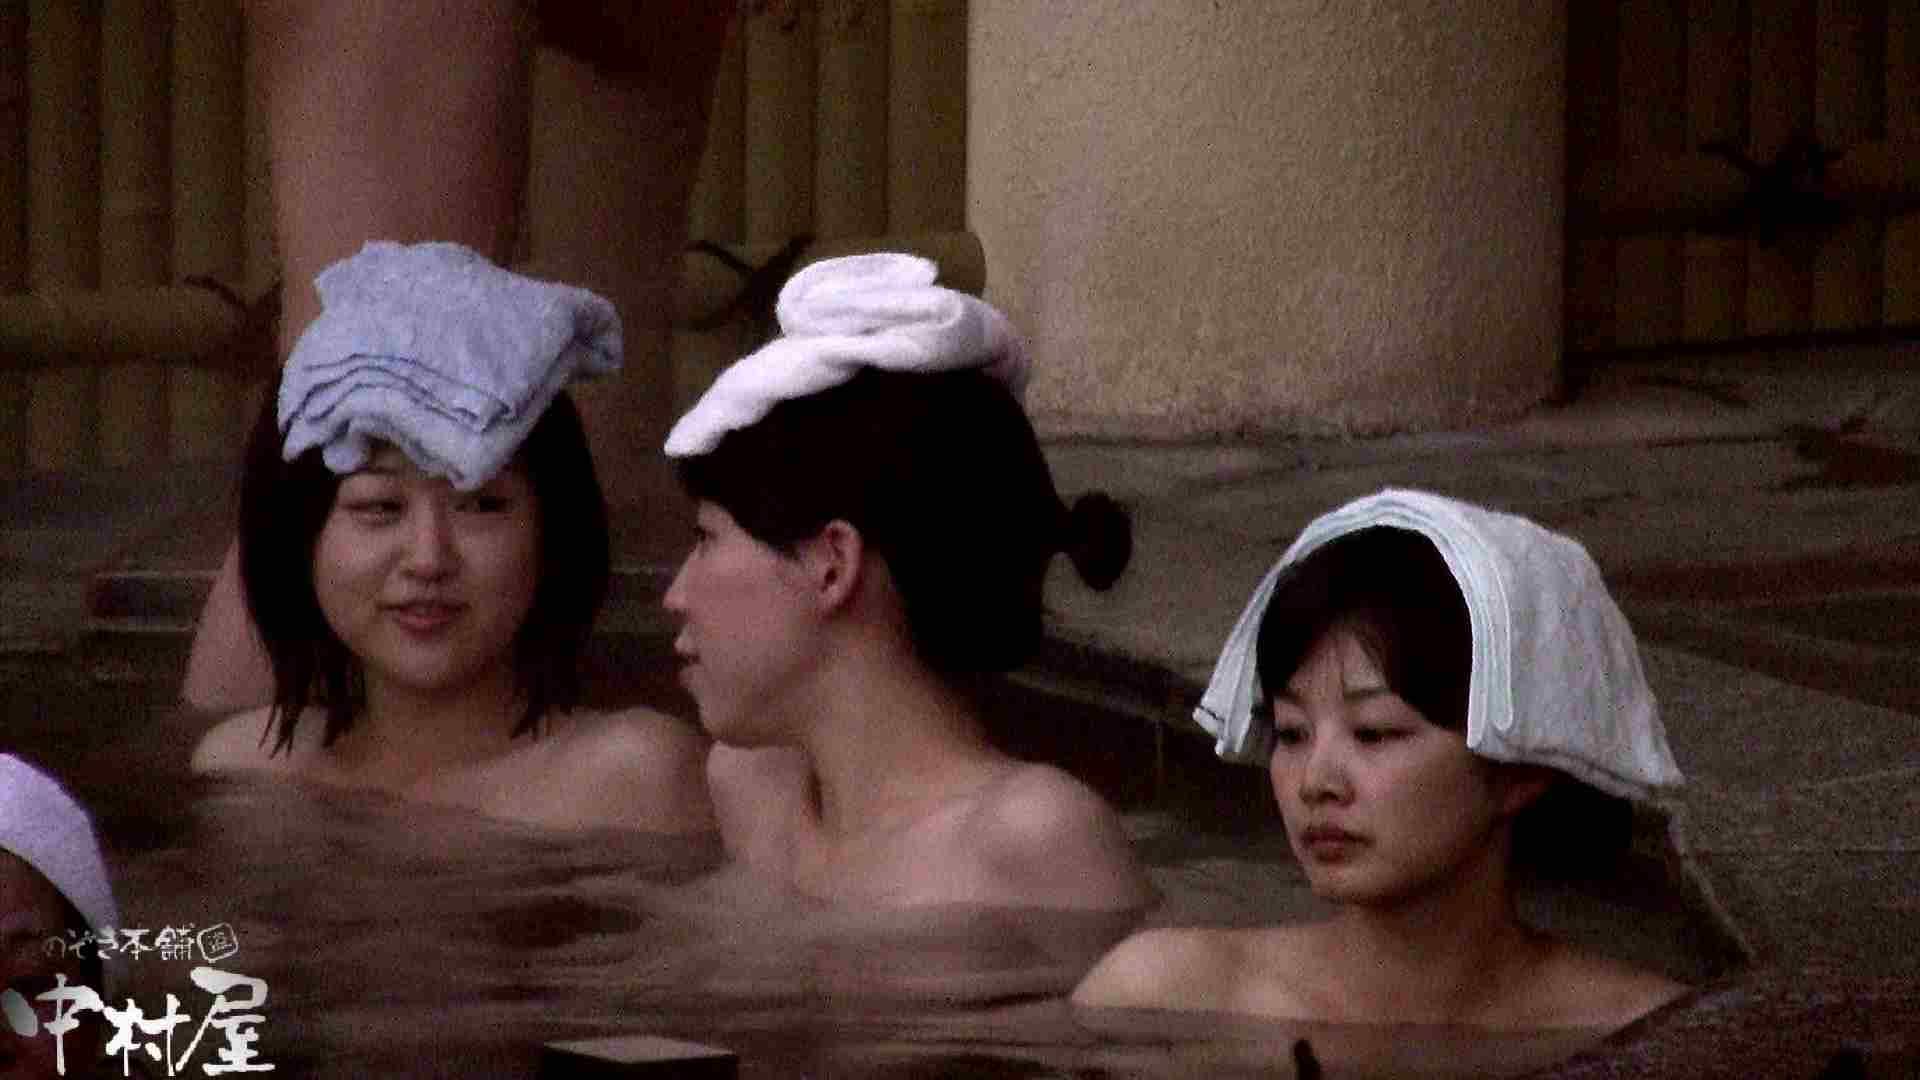 Aquaな露天風呂Vol.916 盗撮映像  73Pix 67